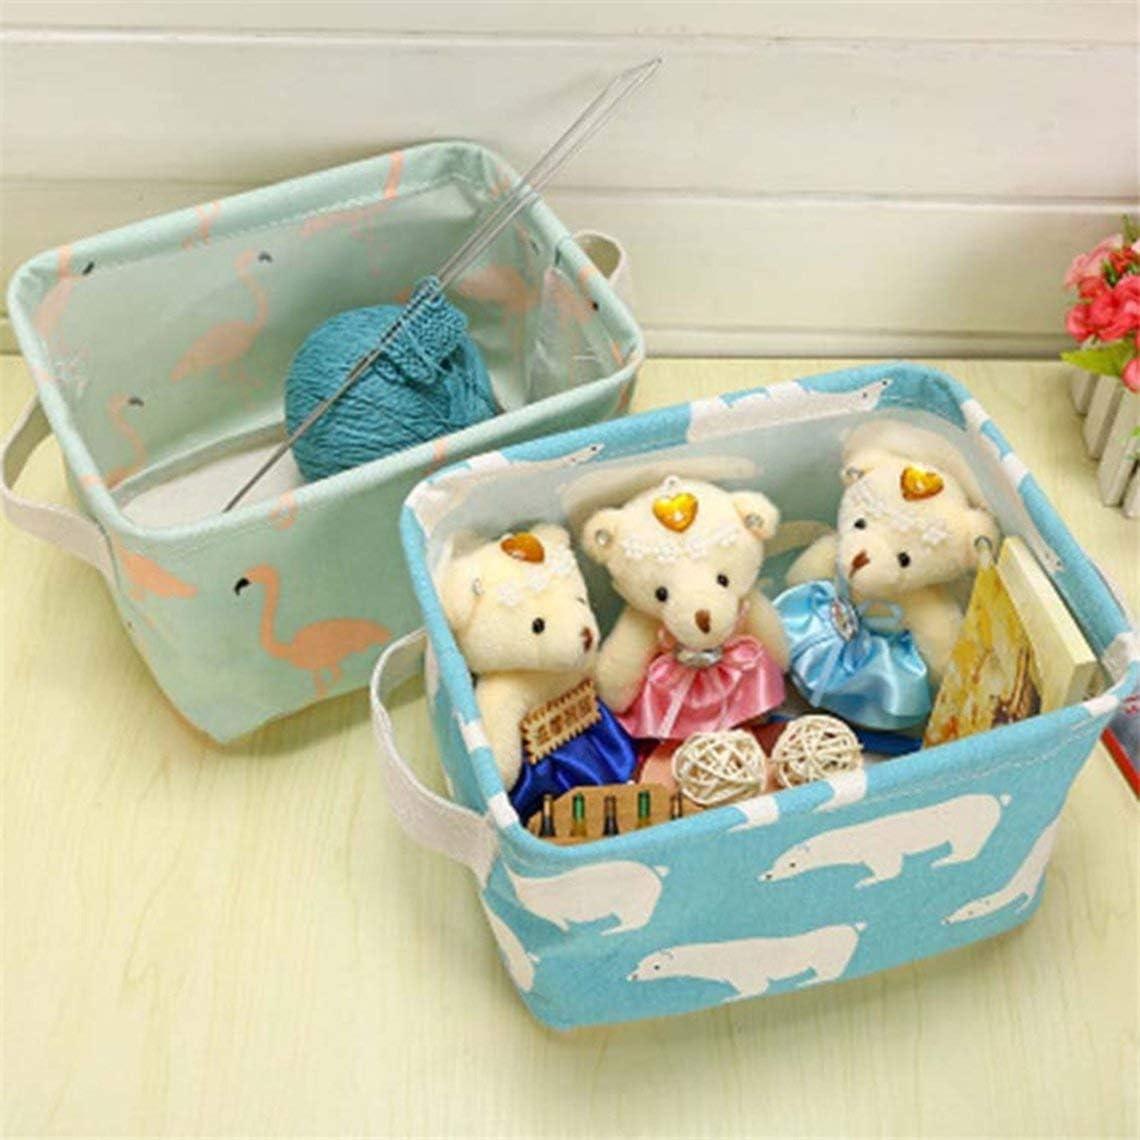 Cotton Storage Basket Portable Small Bath Basket Desktop Storage Box Kitchen Basket Home Organizer